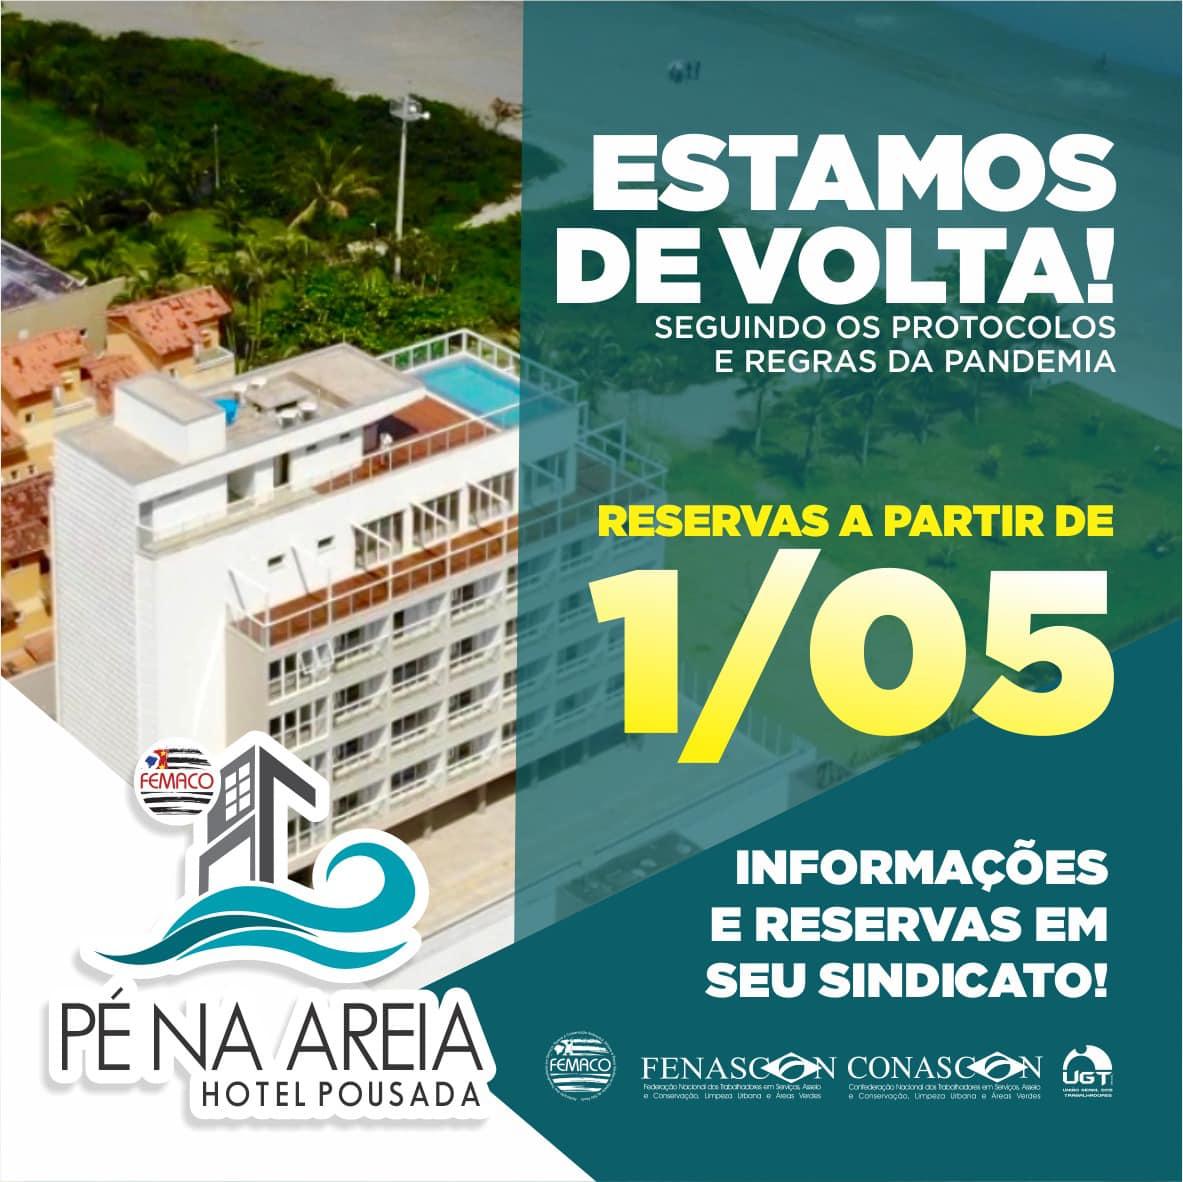 HOTEL E POUSADA PÉ NA AREIA ESTÁ DE VOLTA!